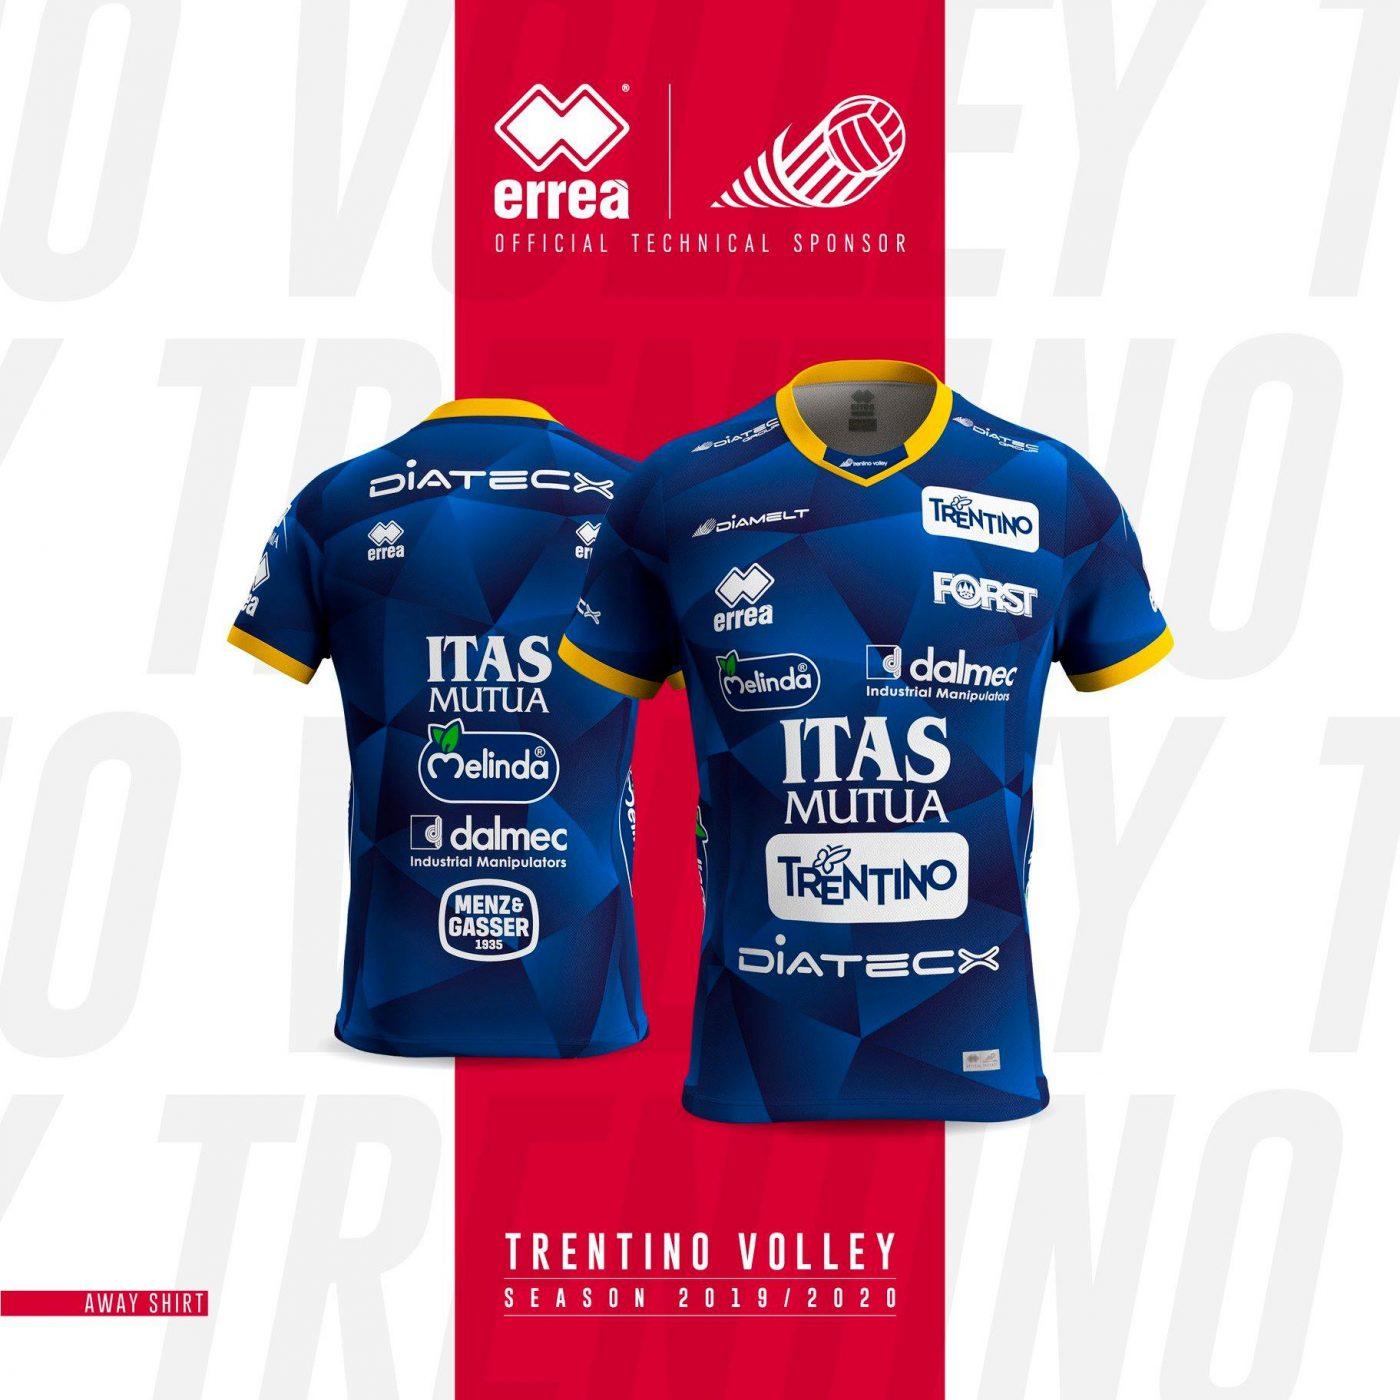 maillot-volley-serie-a-italienne-trentino-errea-2